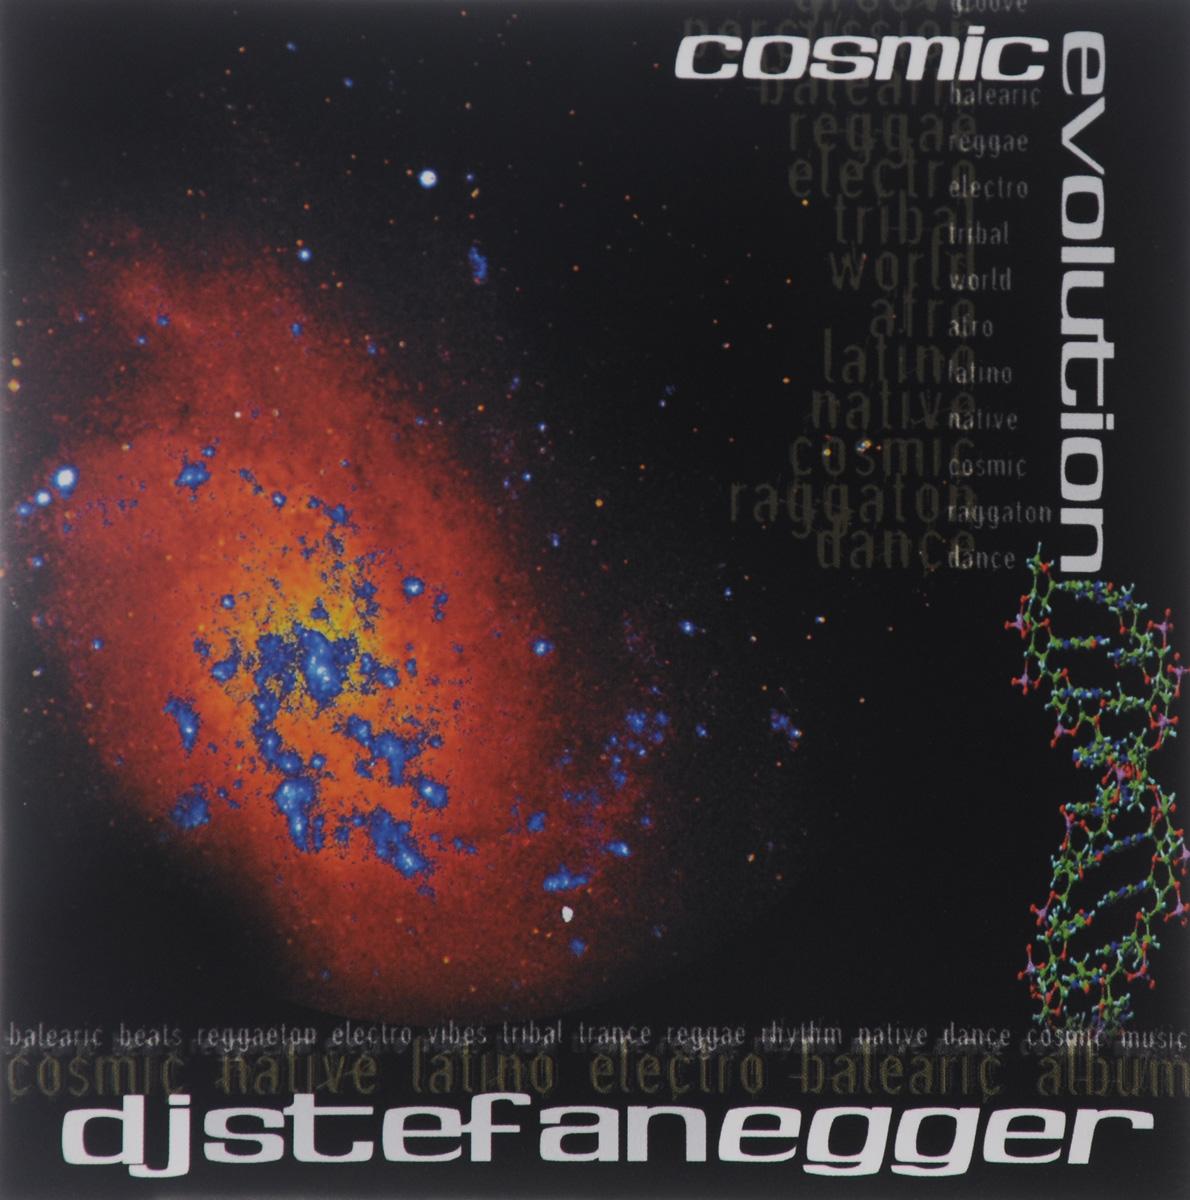 Stefan Egger / DJ Stefan Egger DJ Stefan Egger. Cosmic Evolution stefan egger dj stefan egger dj stefan egger cosmic evolution